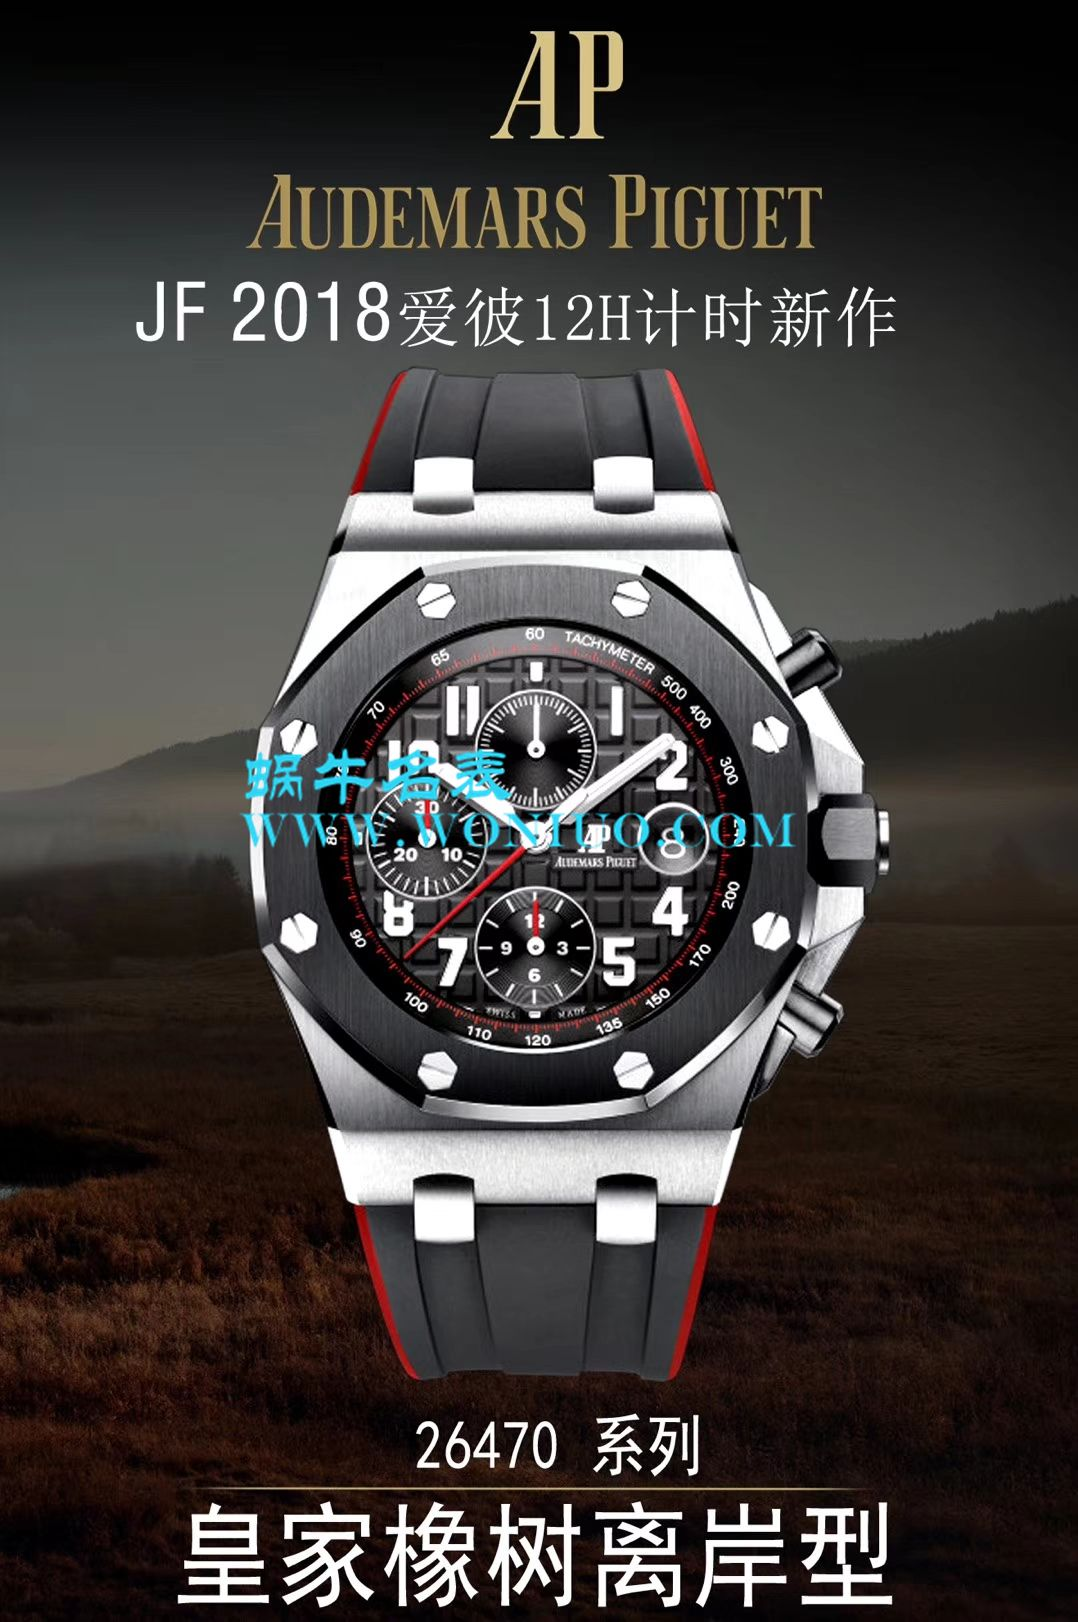 JF 爱彼2018最新巨作 AP26470钢壳陶瓷圈新品. / AP136